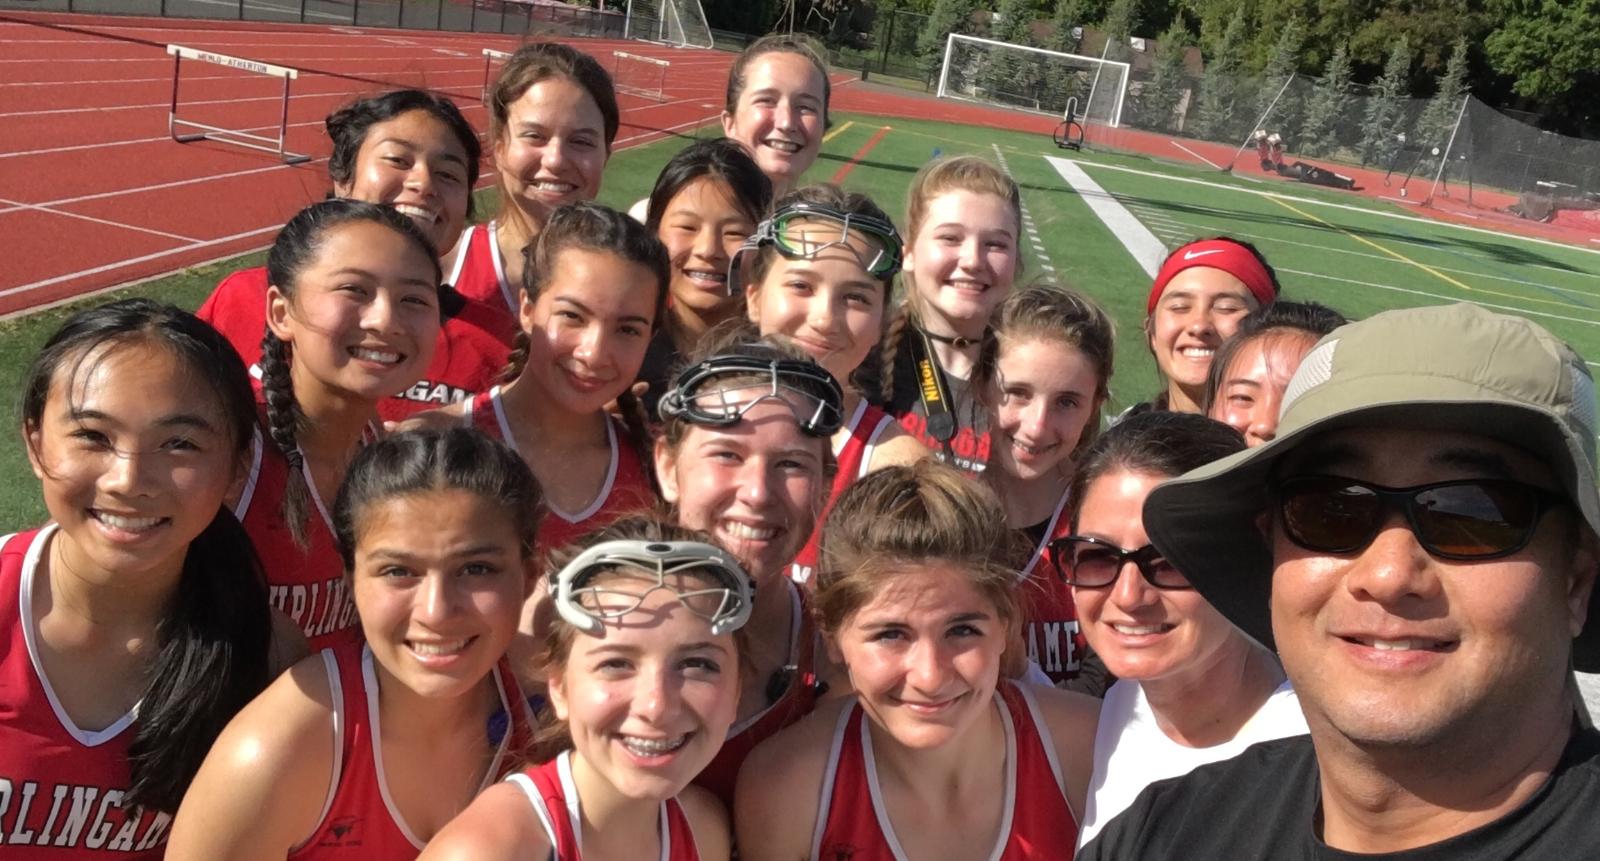 JV Girls Lacrosse take 3rd place at M.A. tourney!